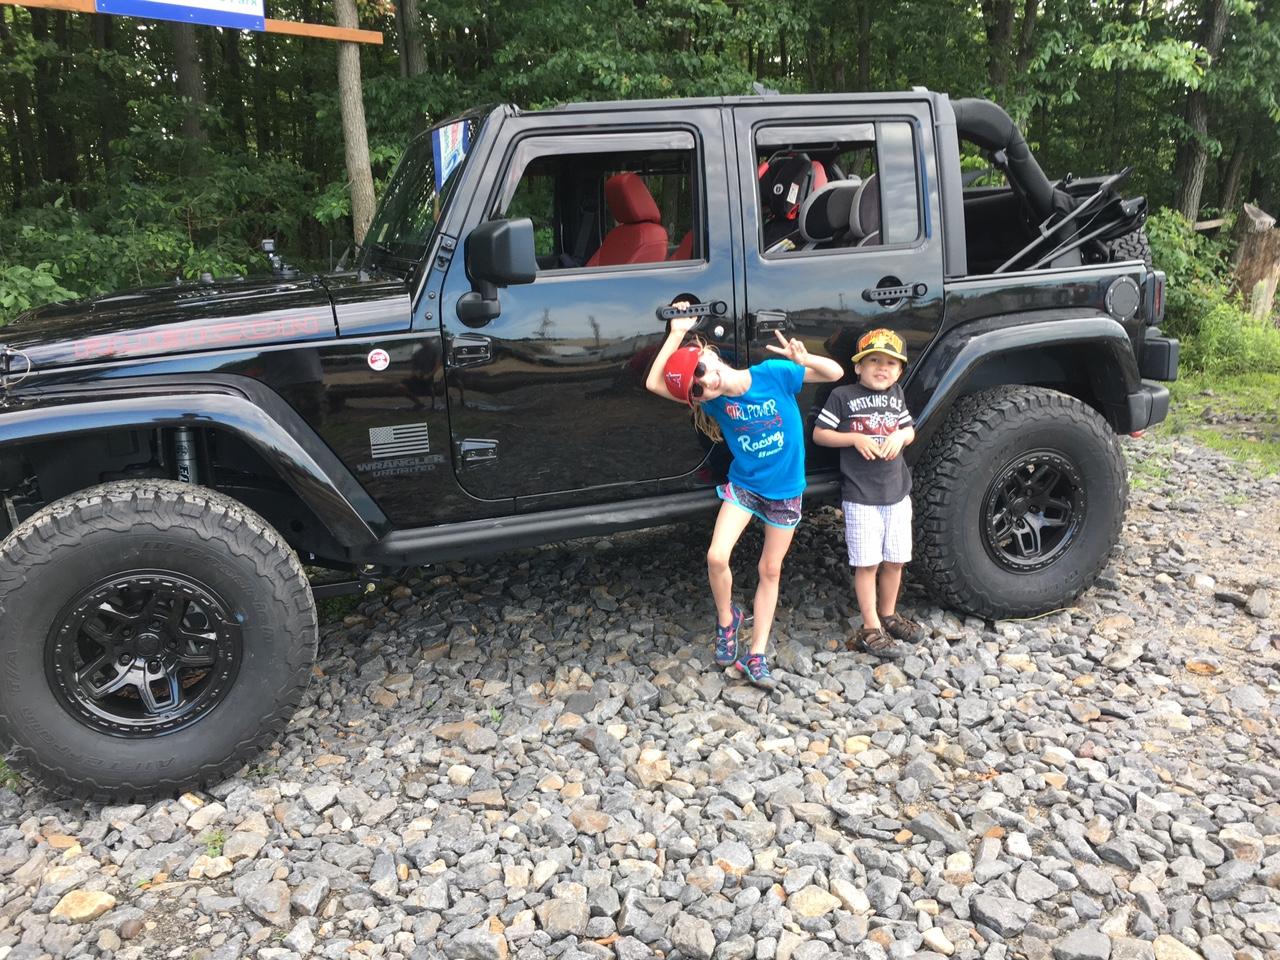 Aev Jk Borah Wheels Page 2 Jeep Wrangler Forum